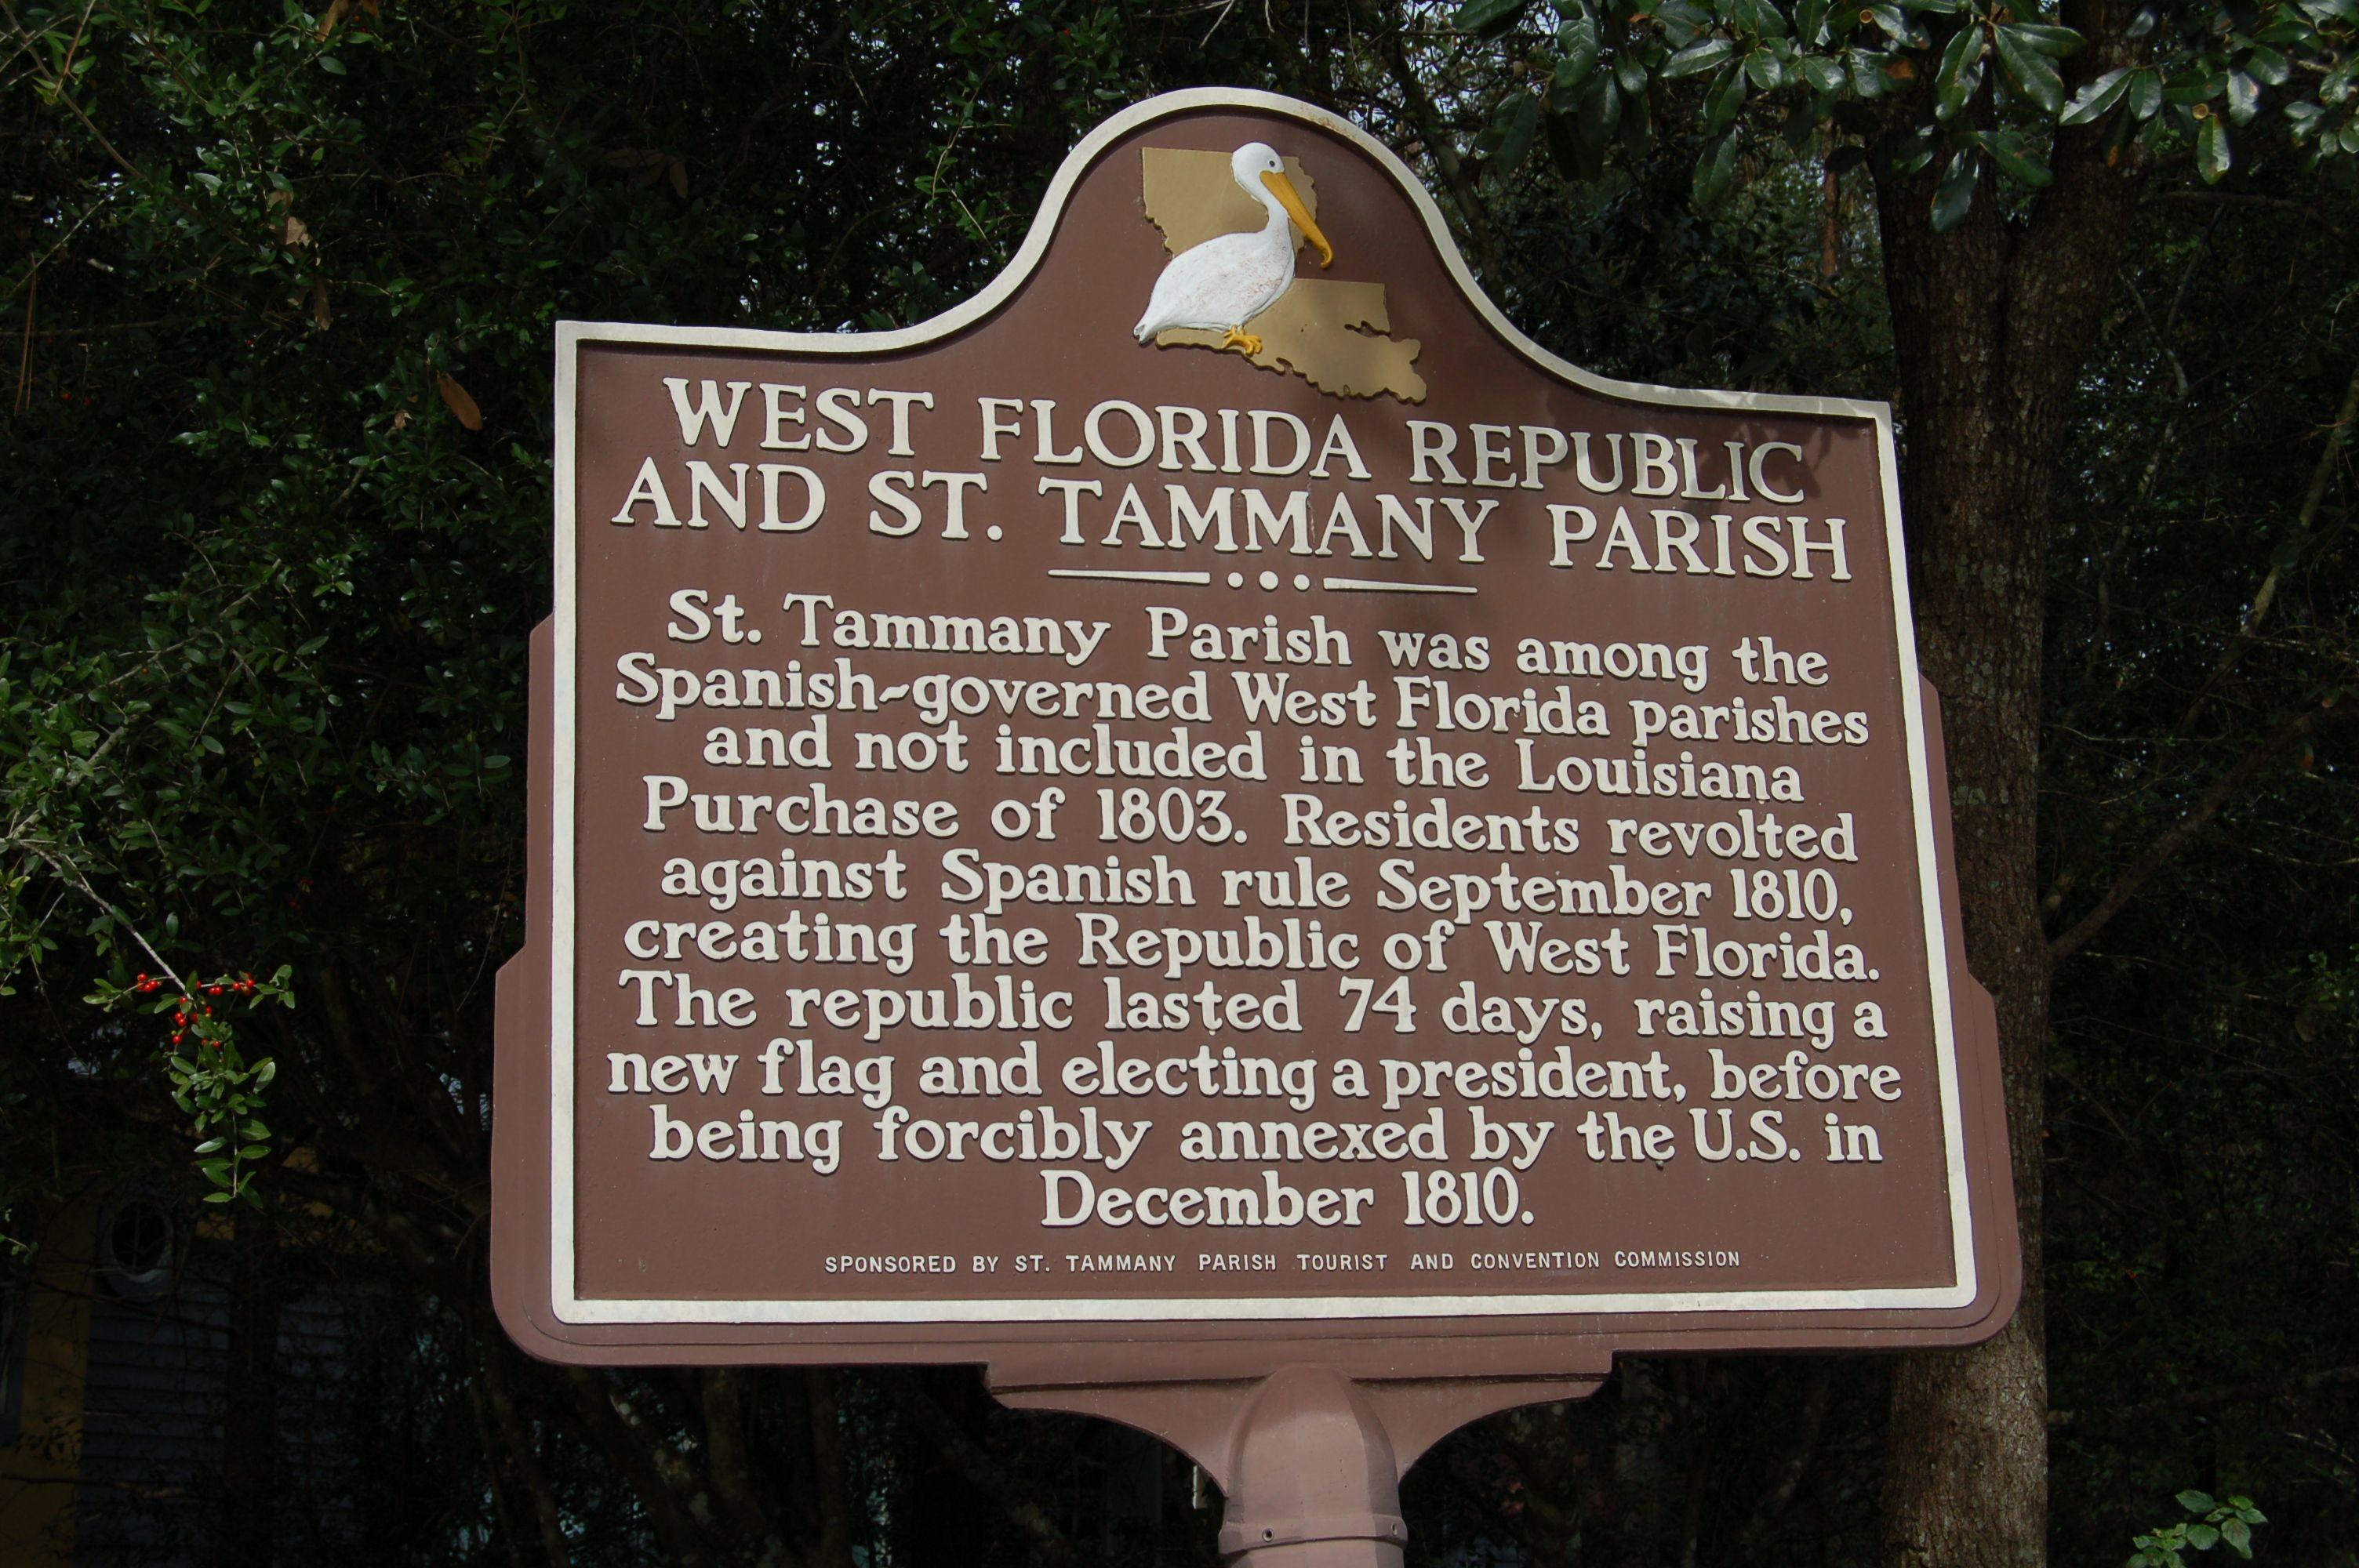 West Florida Republic and St. Tammany Parish, Mandeville